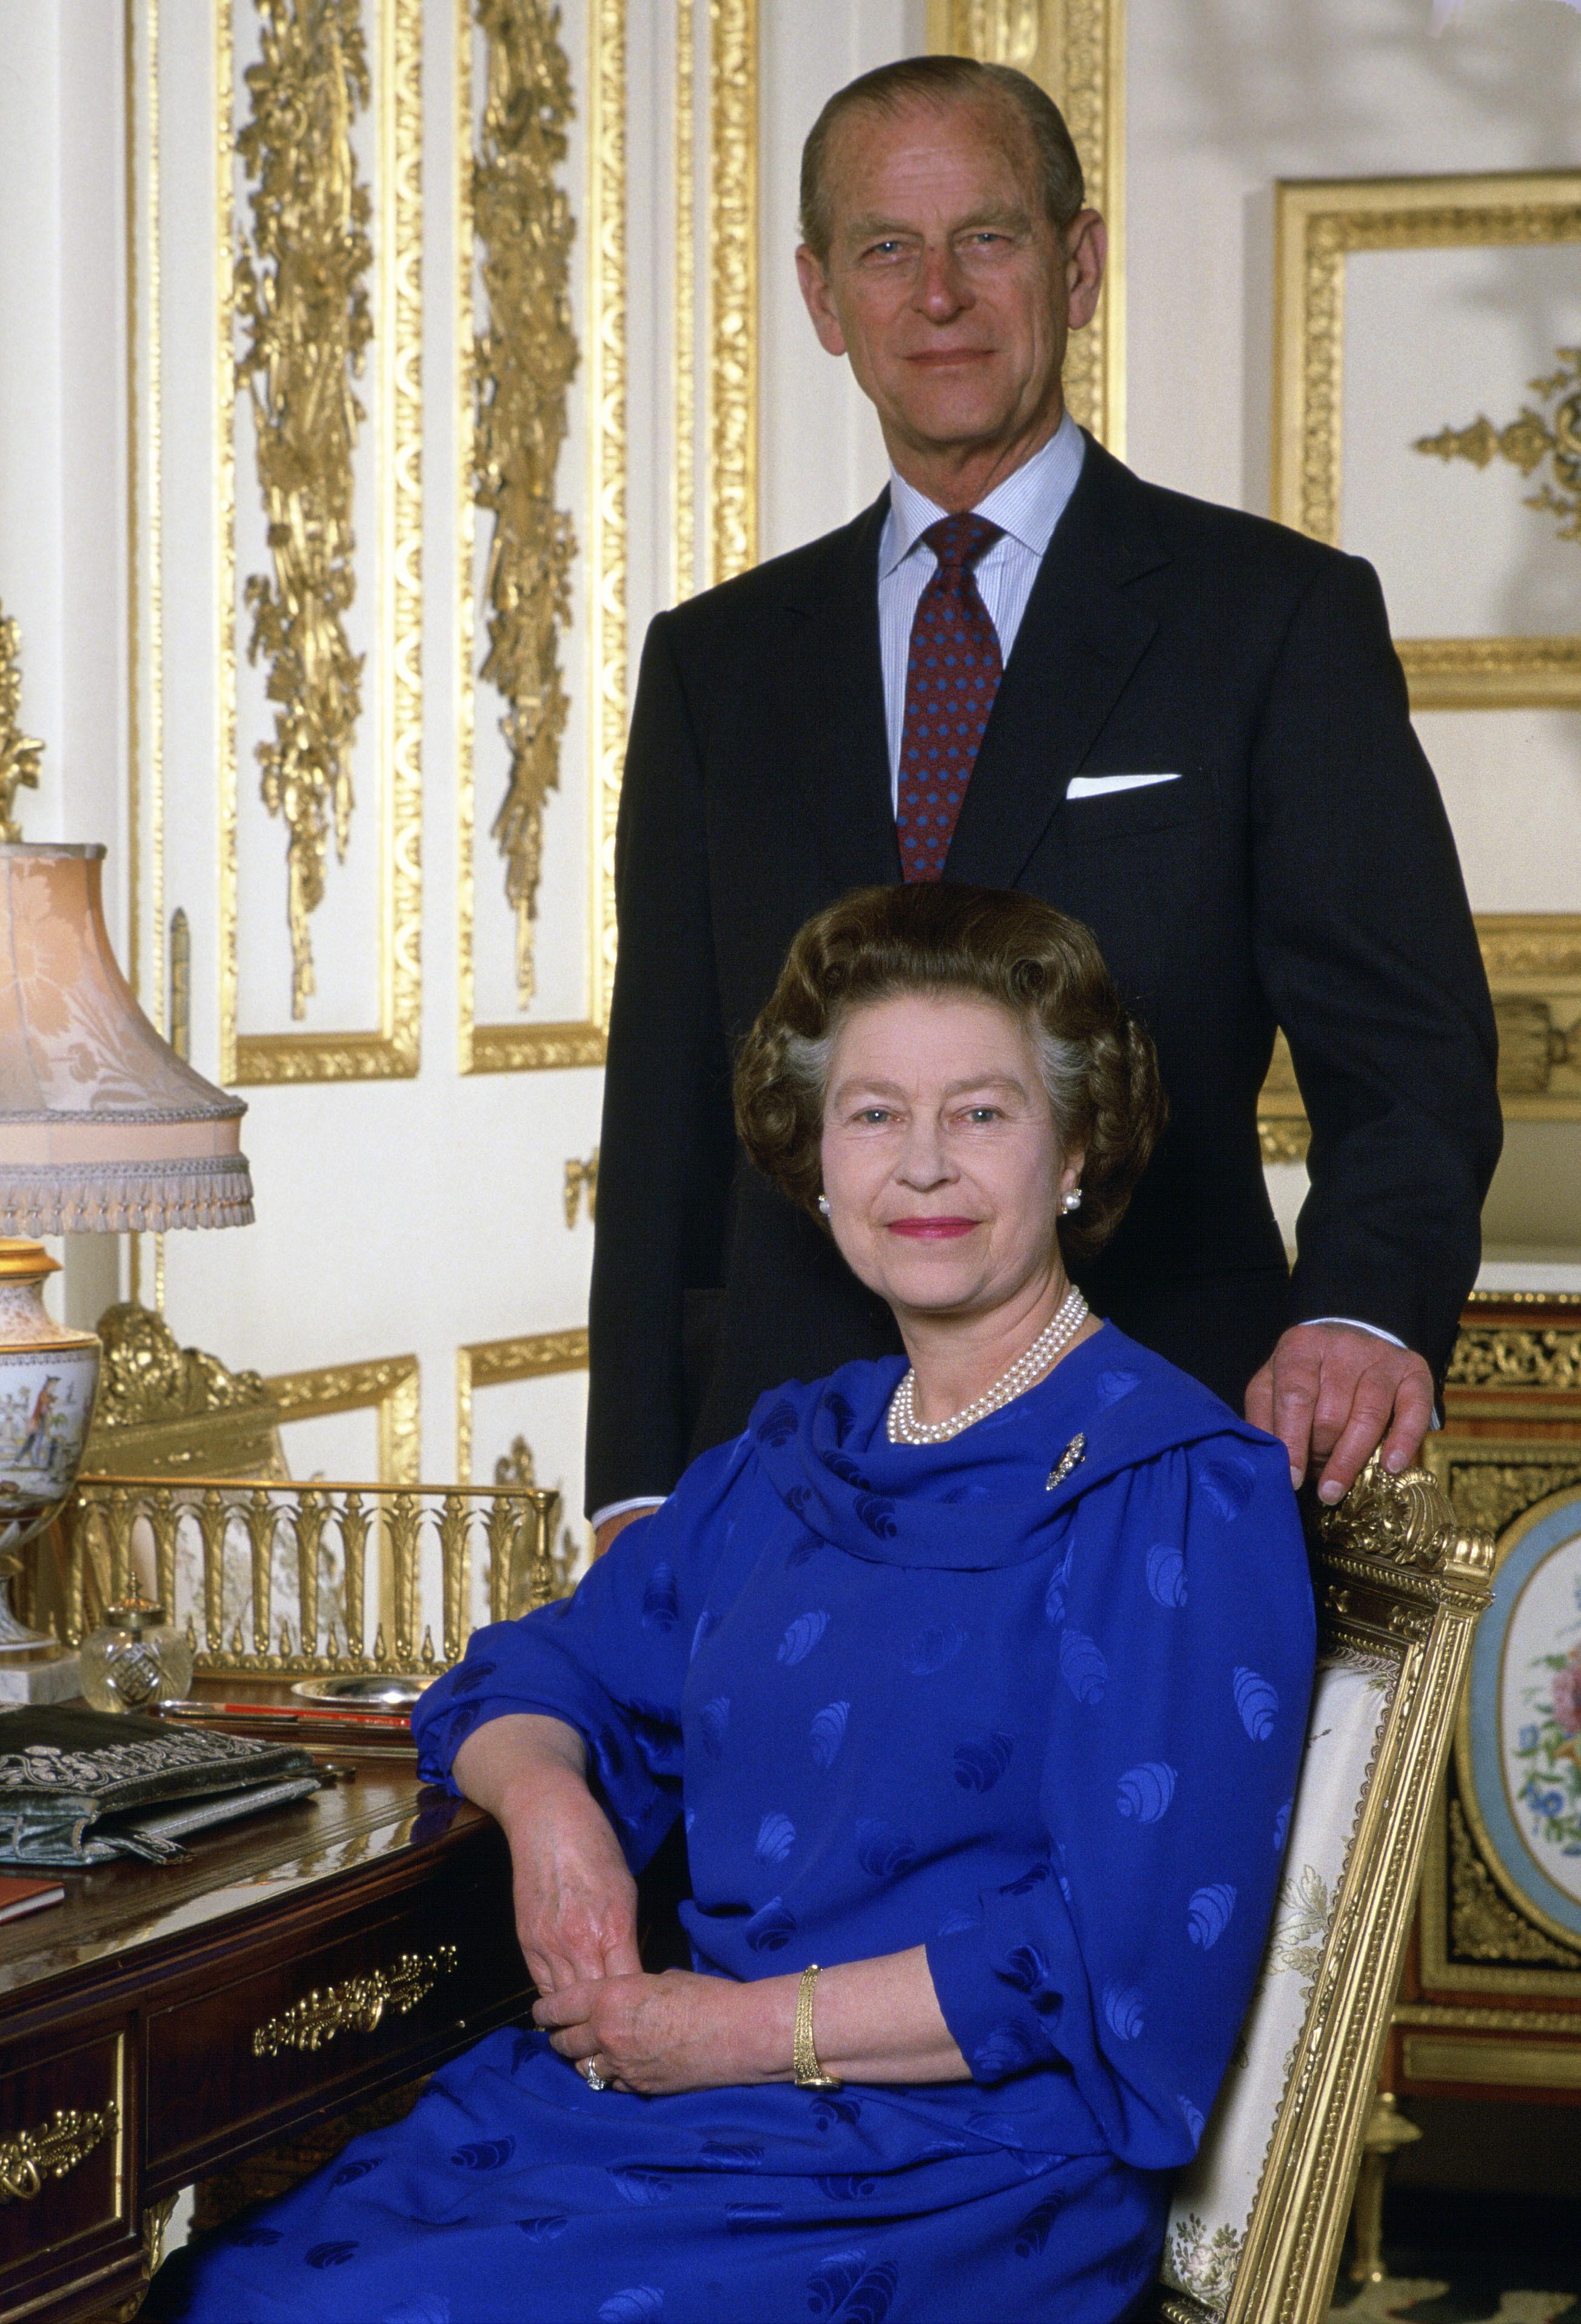 Queen Elizabeth Prince Philip Love 1980s Getty Images